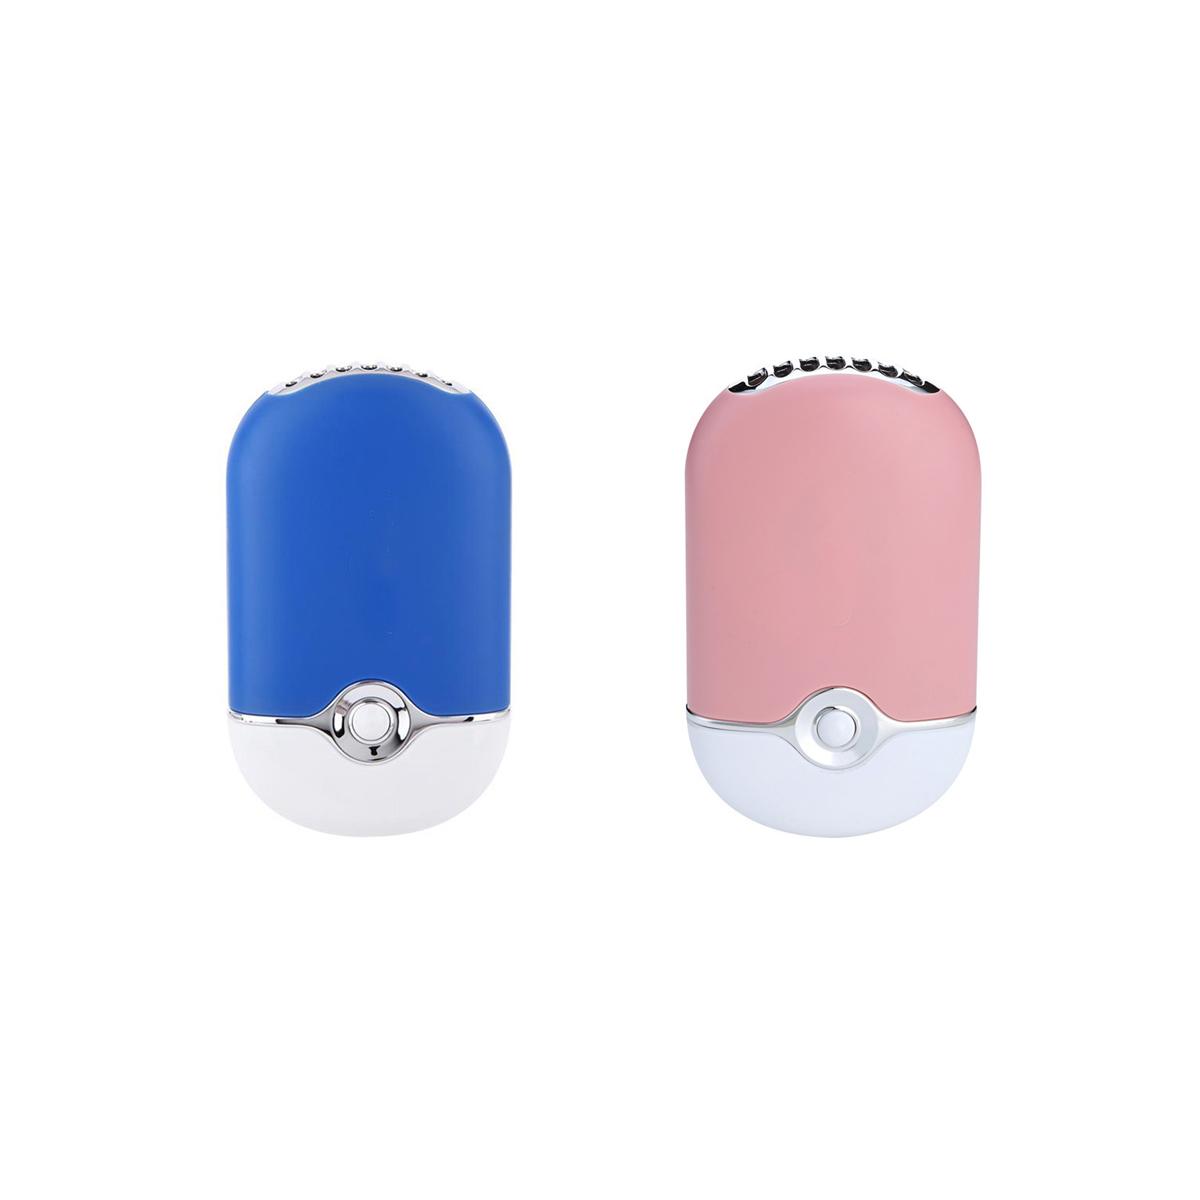 IAG-Mini-Portable-Handheld-Air-Conditioner-Hero-1200×1200